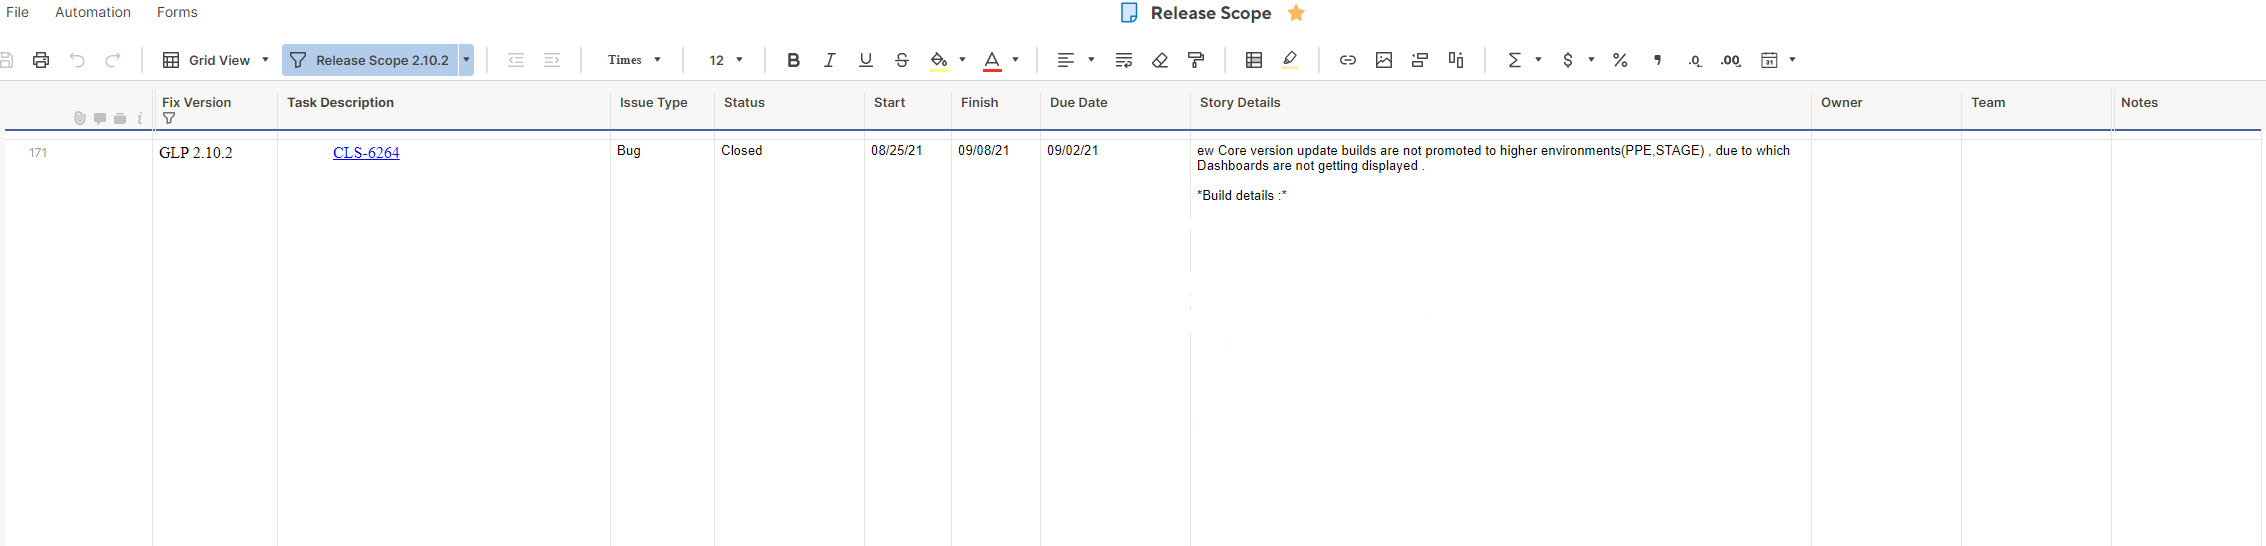 Release Scope Sheet.png